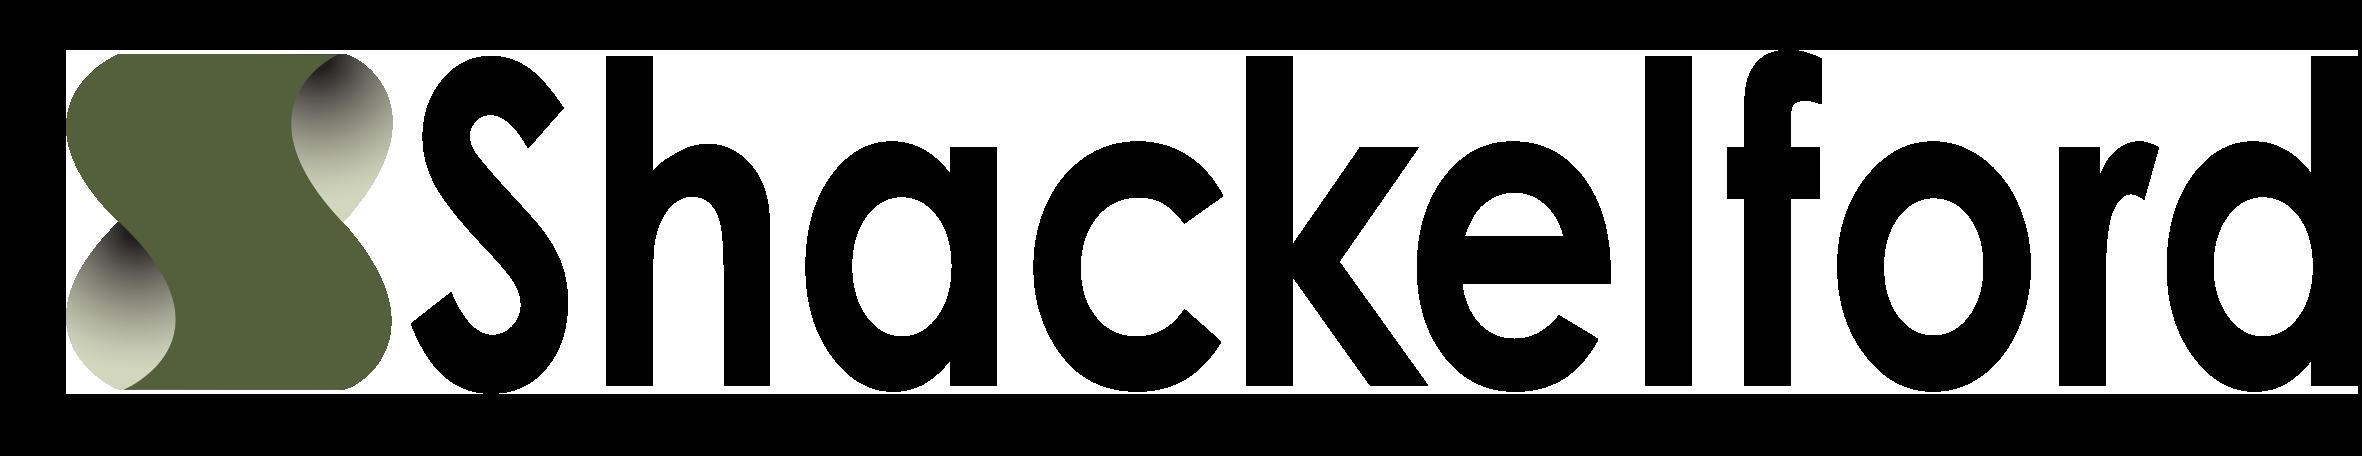 Final Shackelford Logo Colors.png